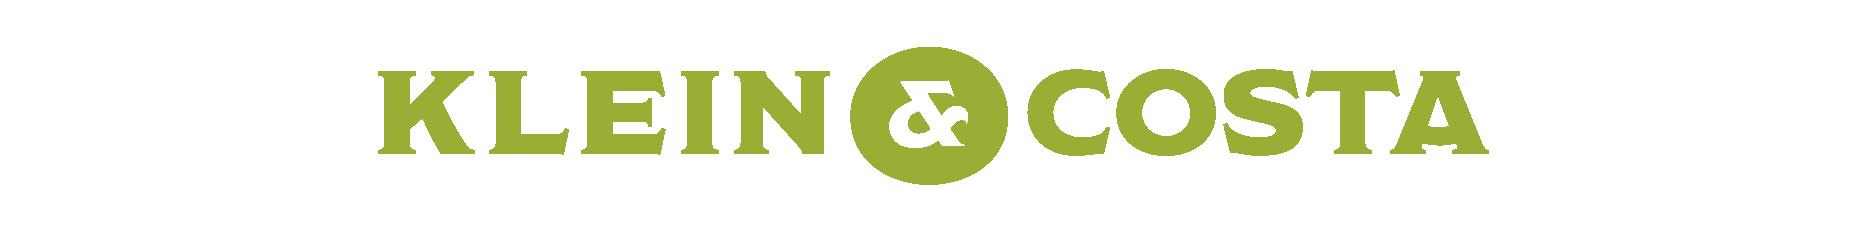 K&C-Logo-NameSub_1@2xGreenMid-SpaceHack.png